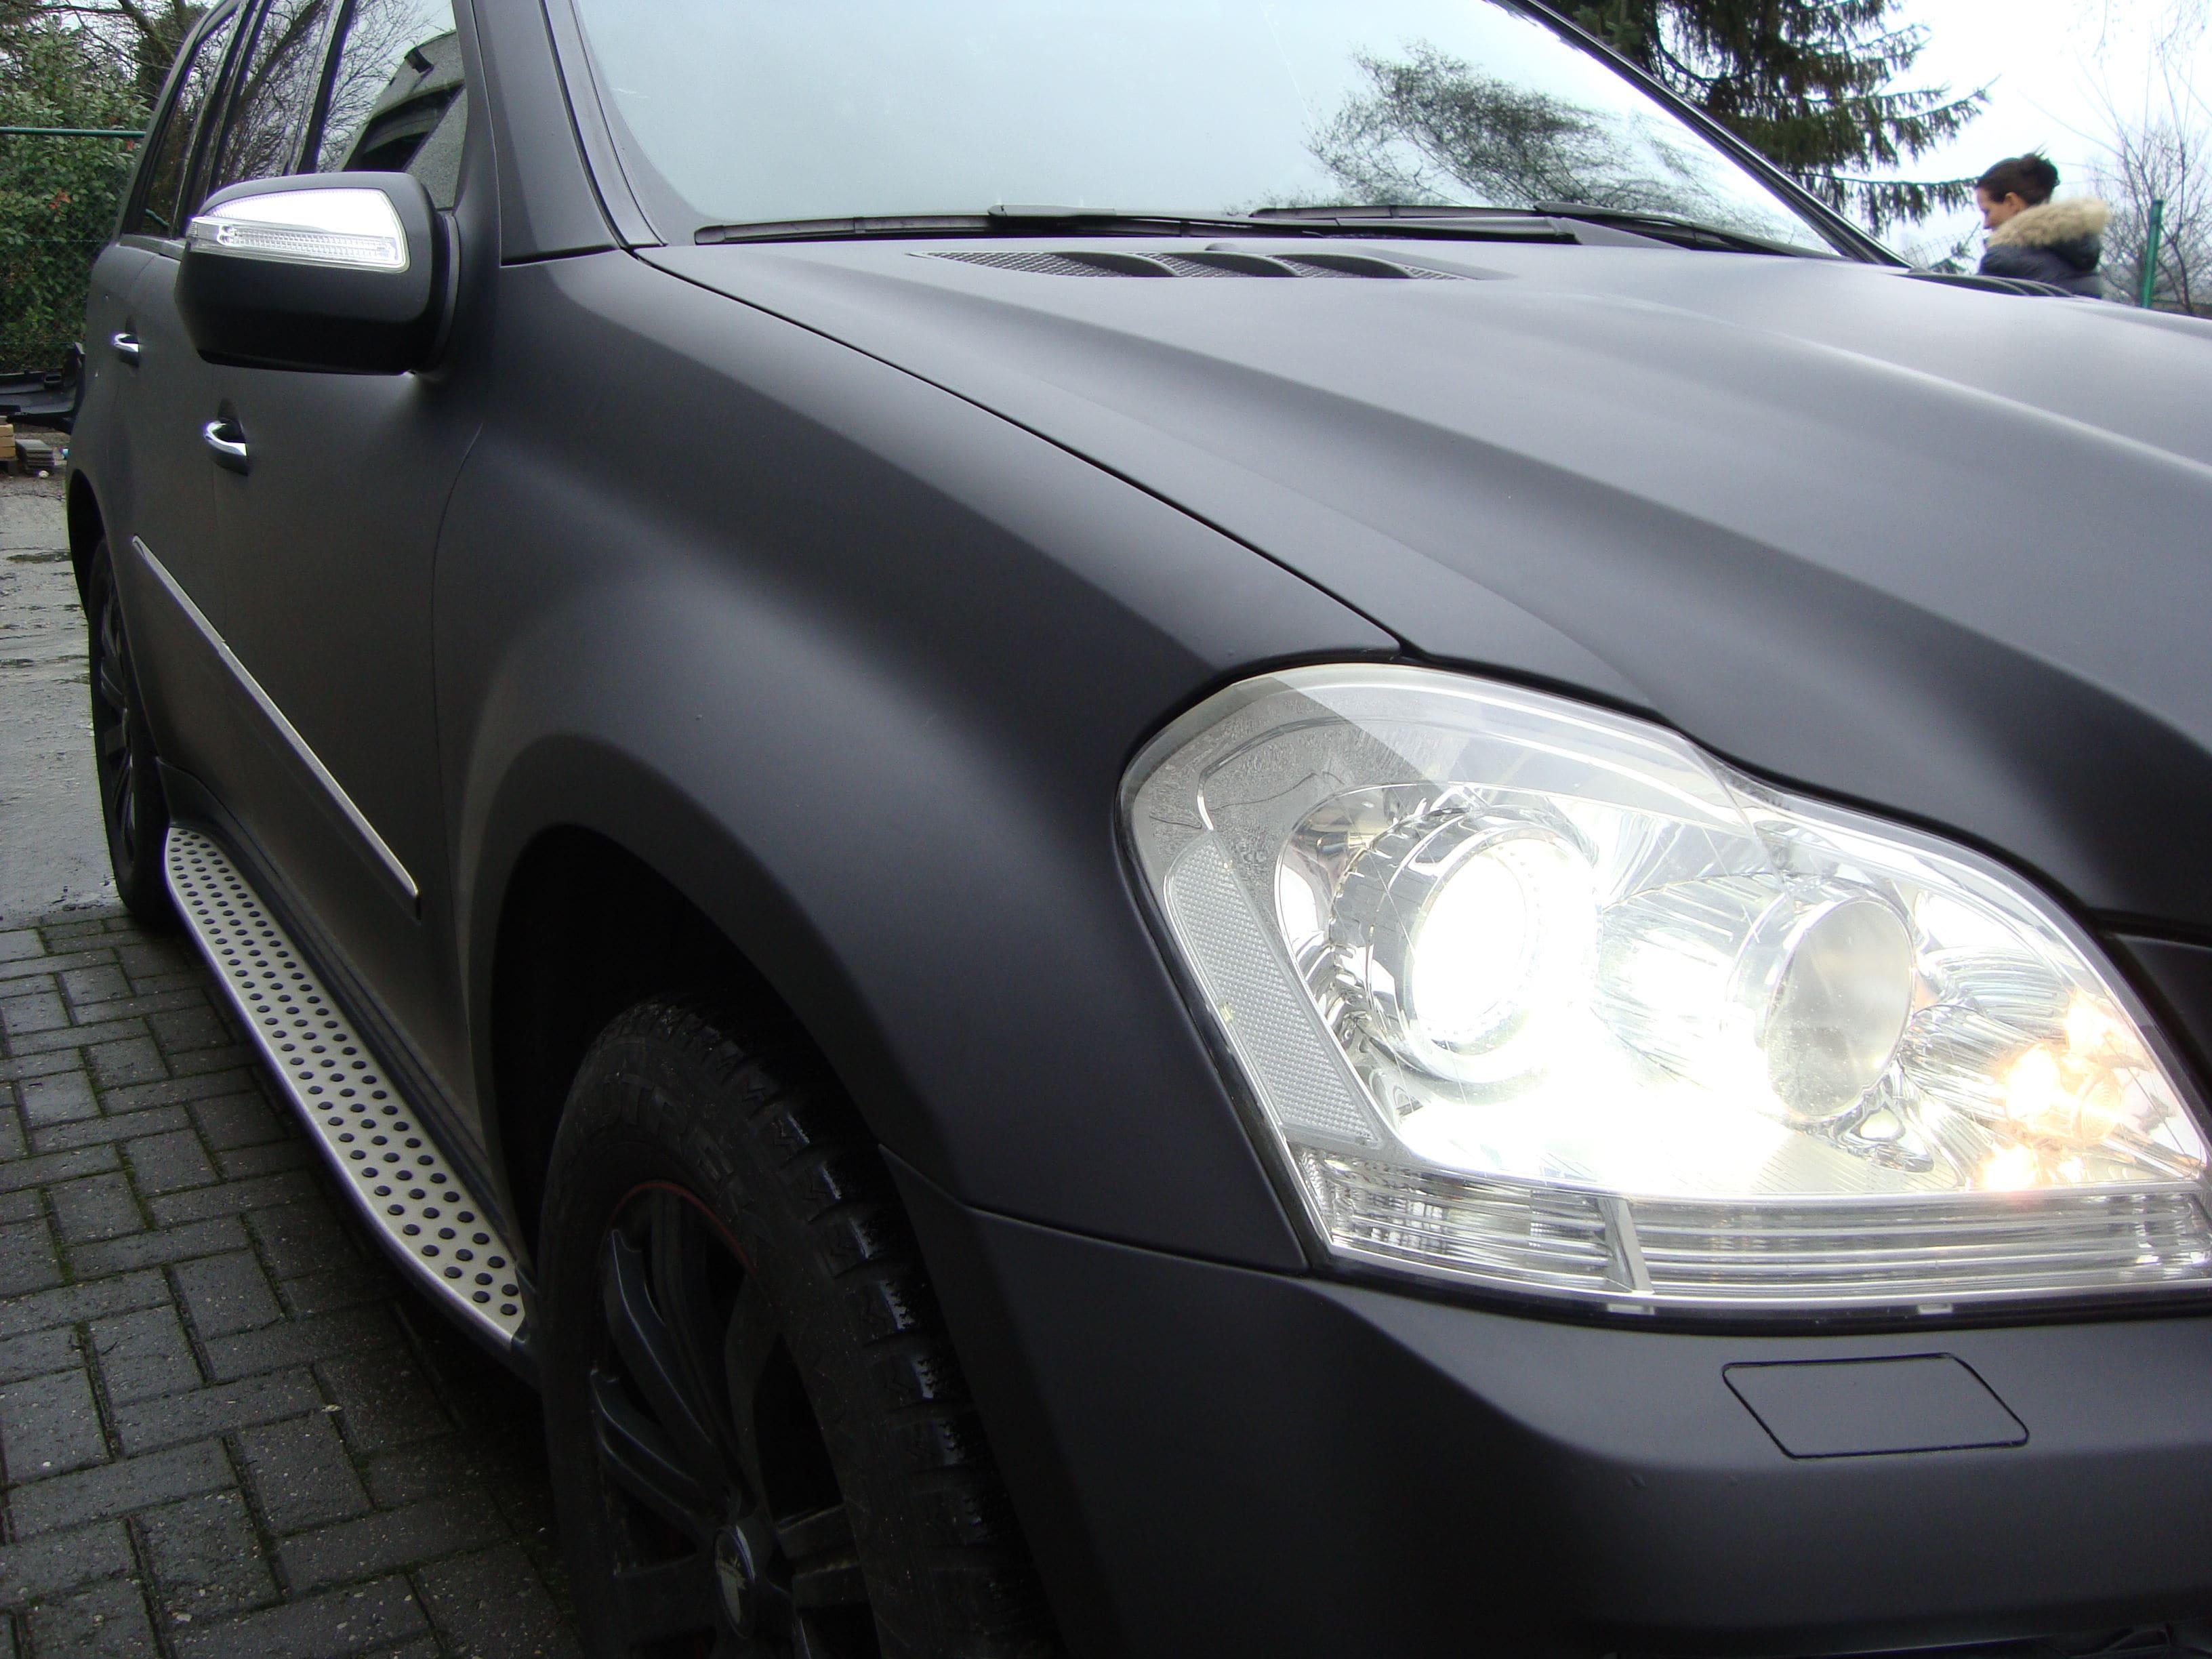 Mercedes GL met Mat Zwarte Wrap, Carwrapping door Wrapmyride.nu Foto-nr:6285, ©2020